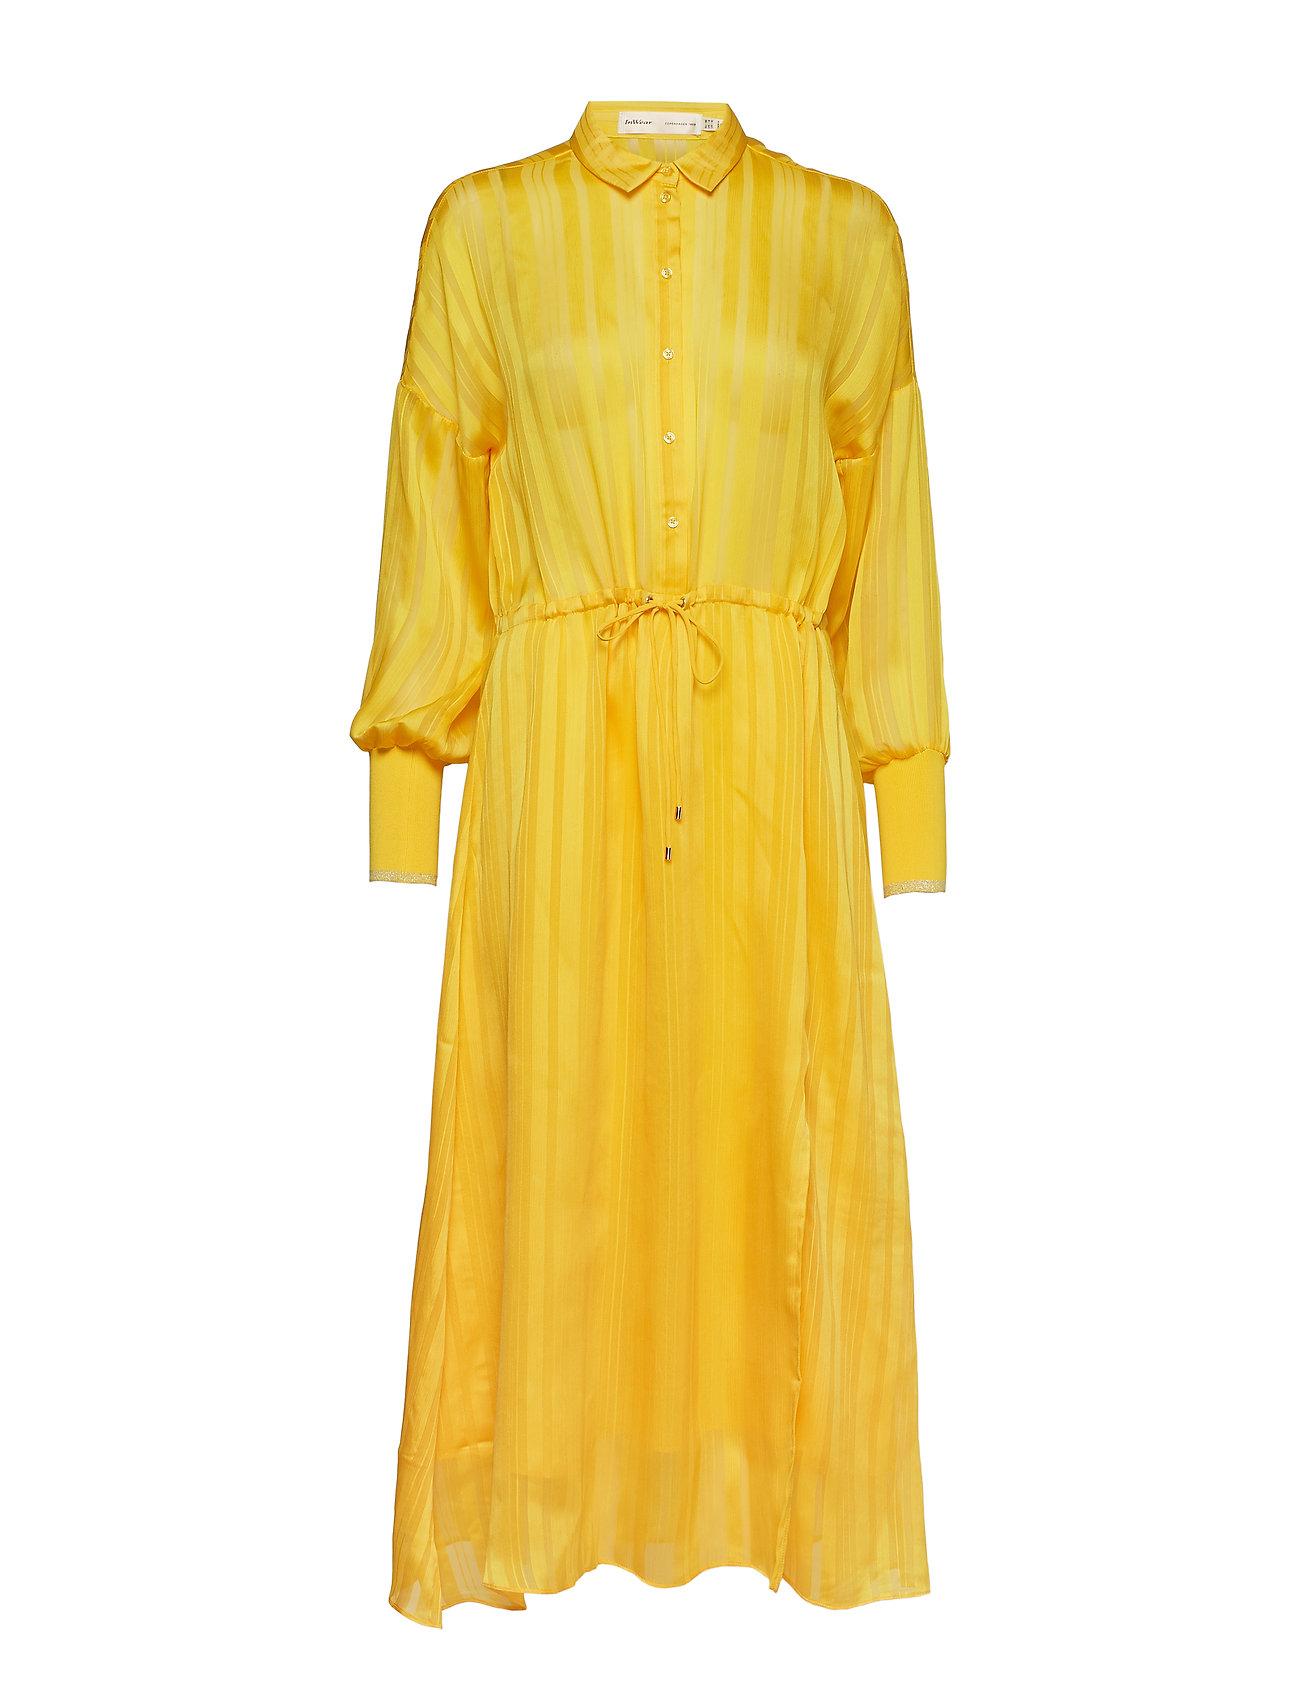 InWear Hollis Dress - SPECTRA YELLOW